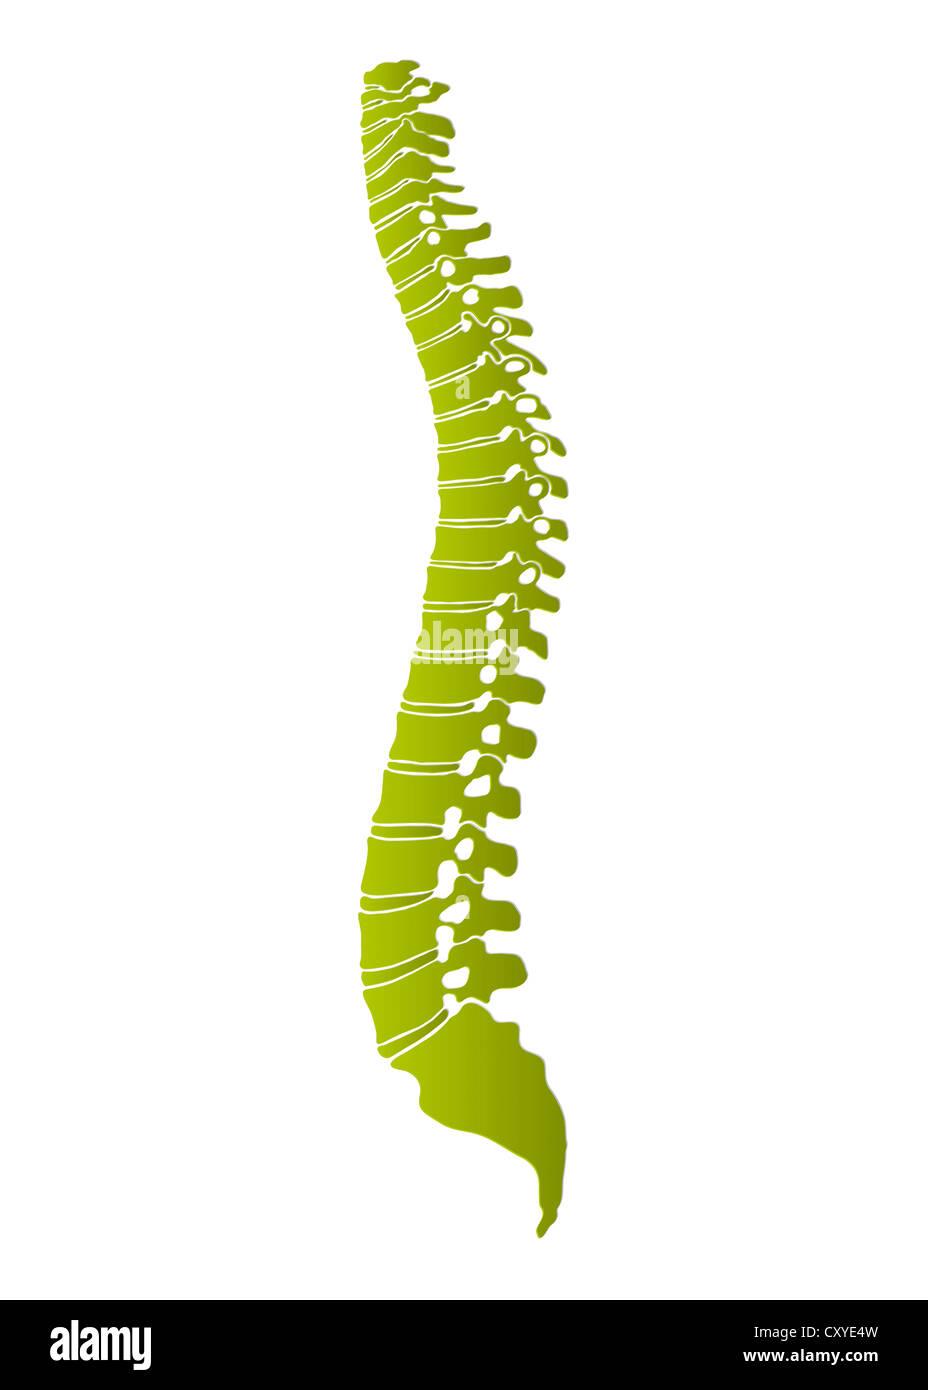 La columna vertebral humana, representación esquemática Foto de stock